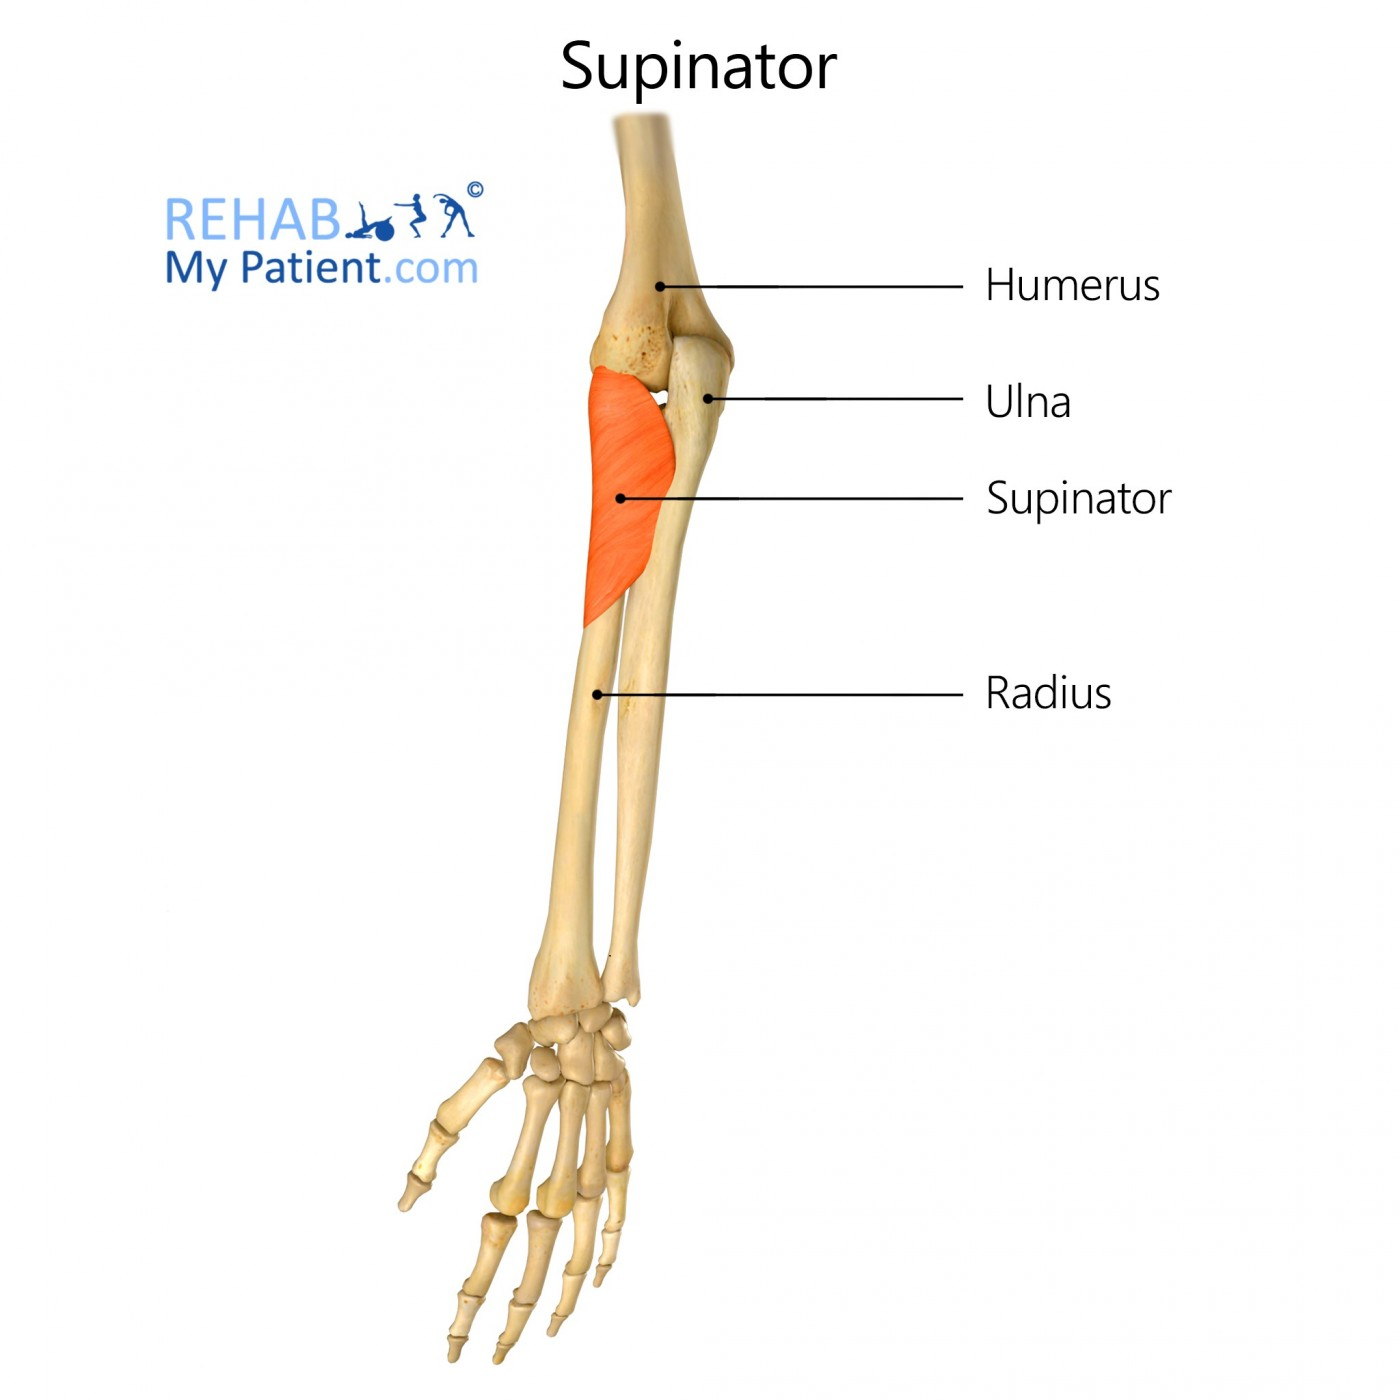 Supinator